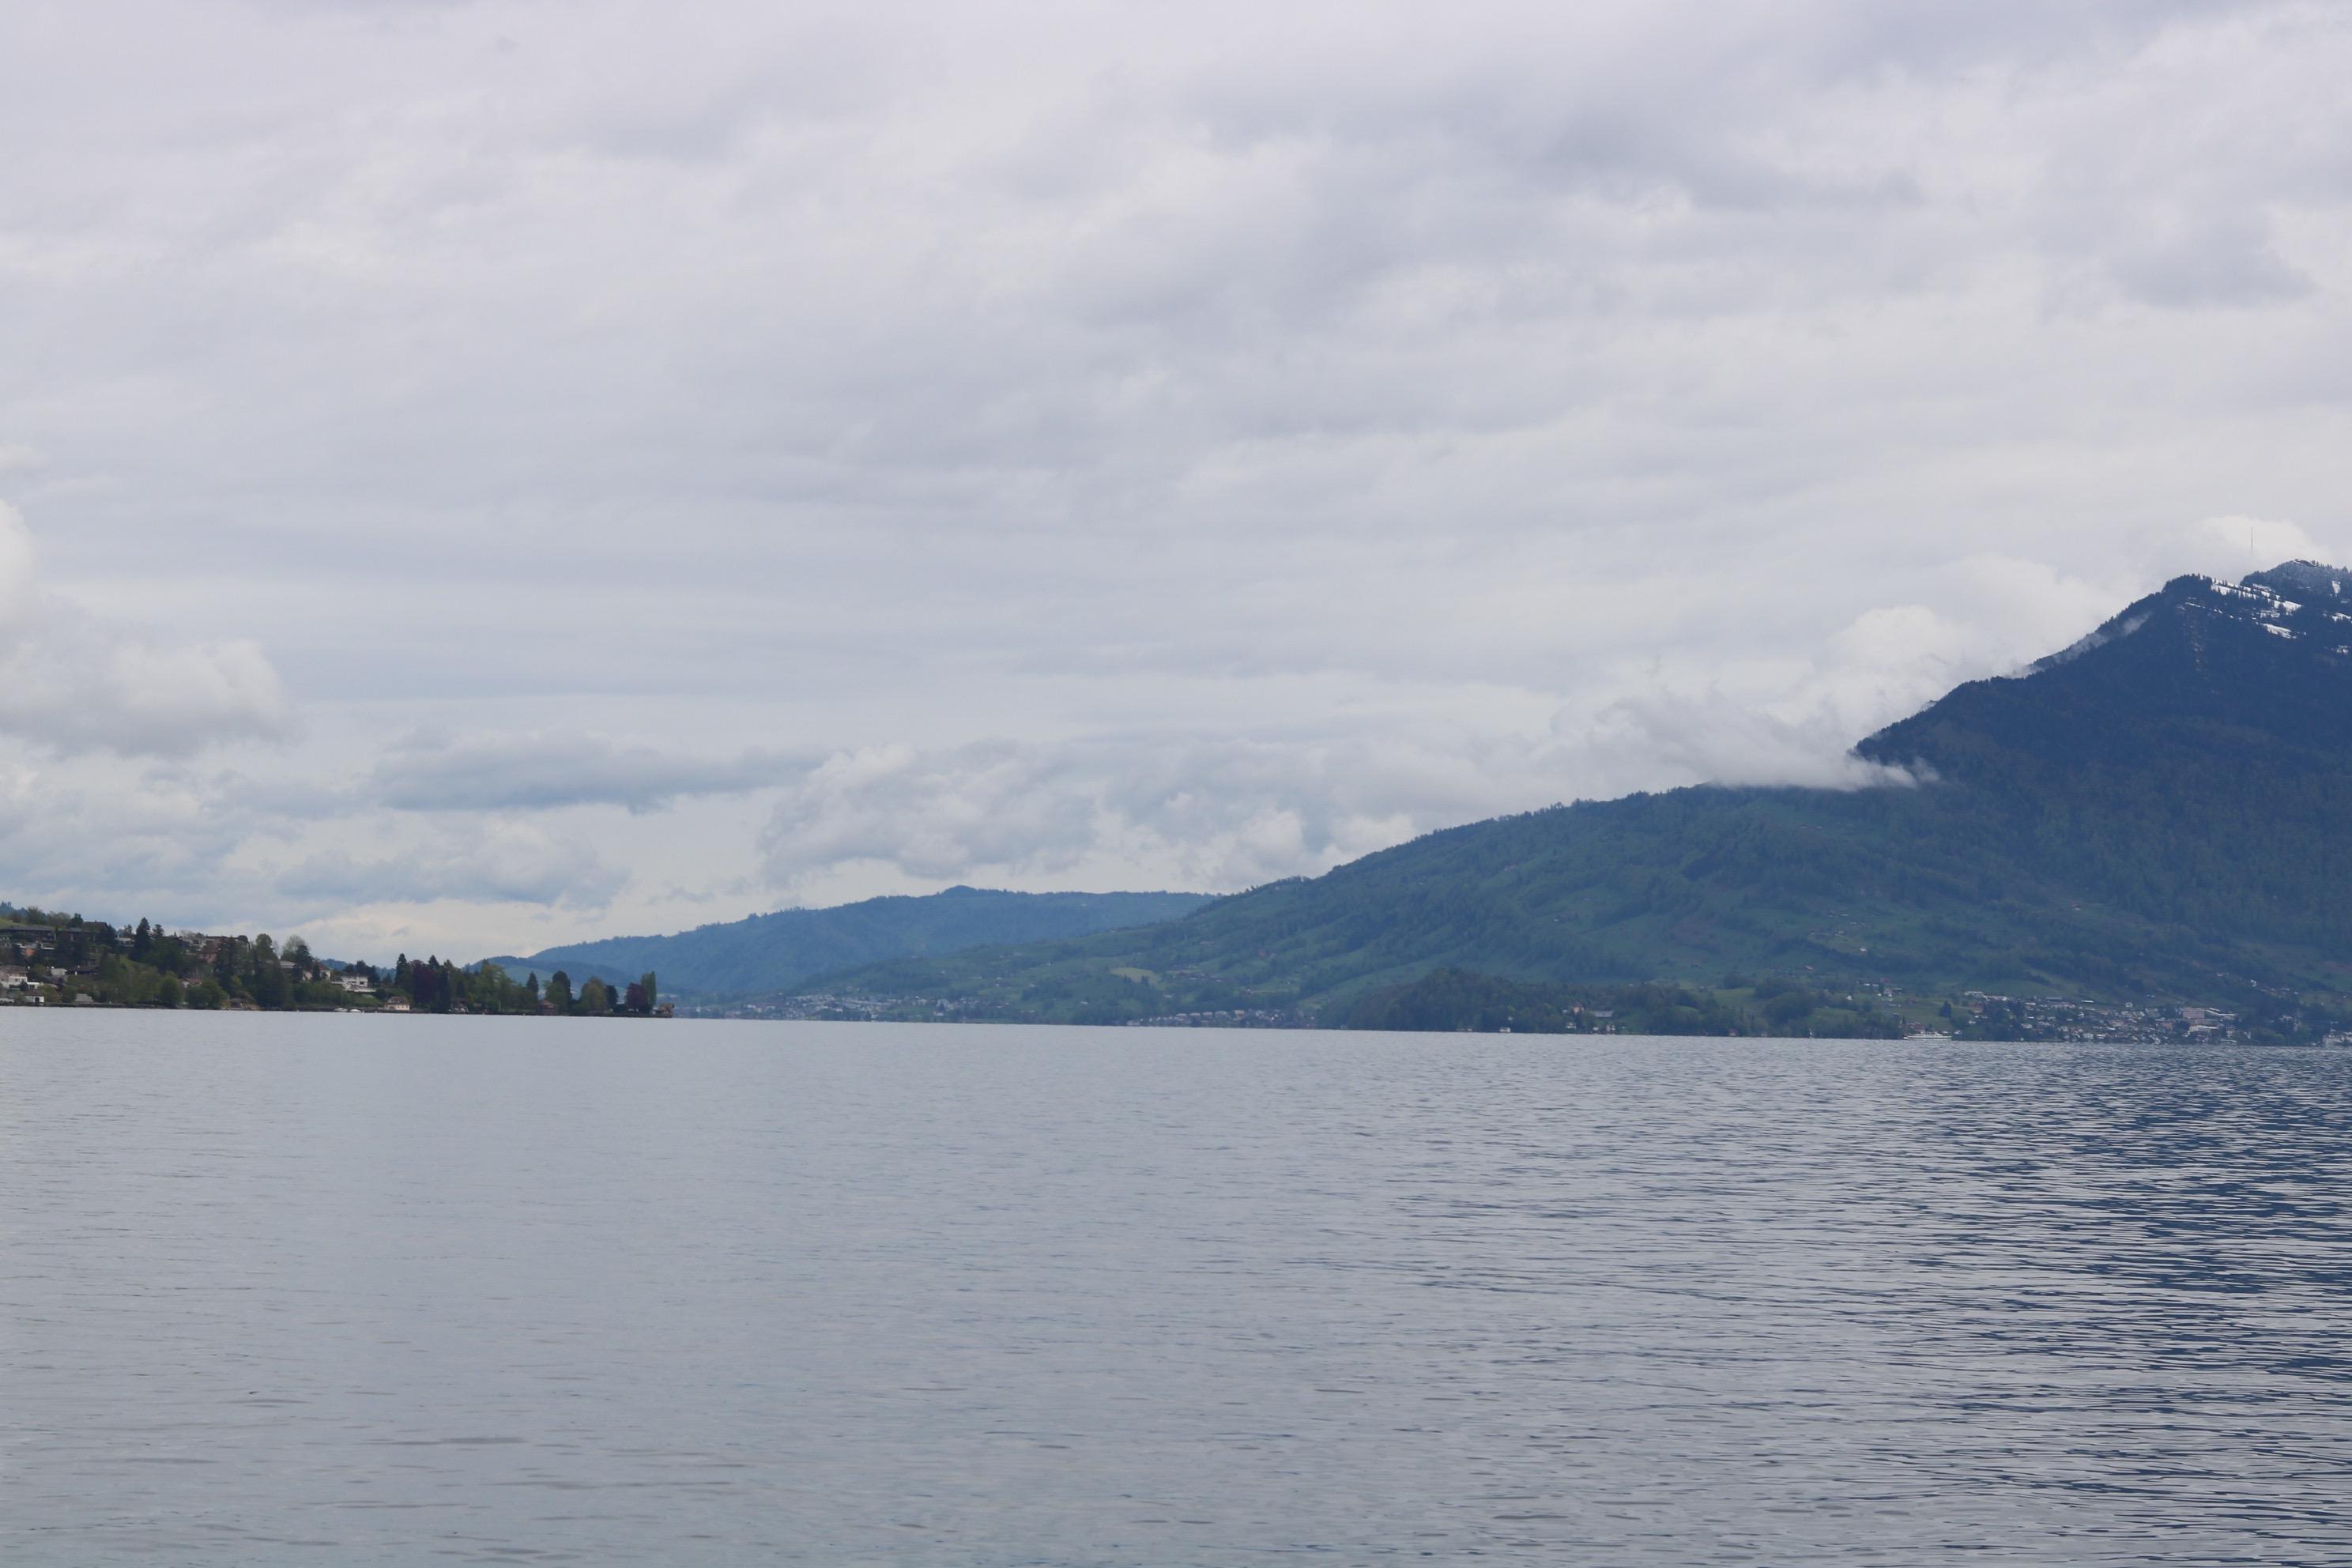 vue lac 4 cantons hotel roggerli blog suisse thereseandthekids famille verre